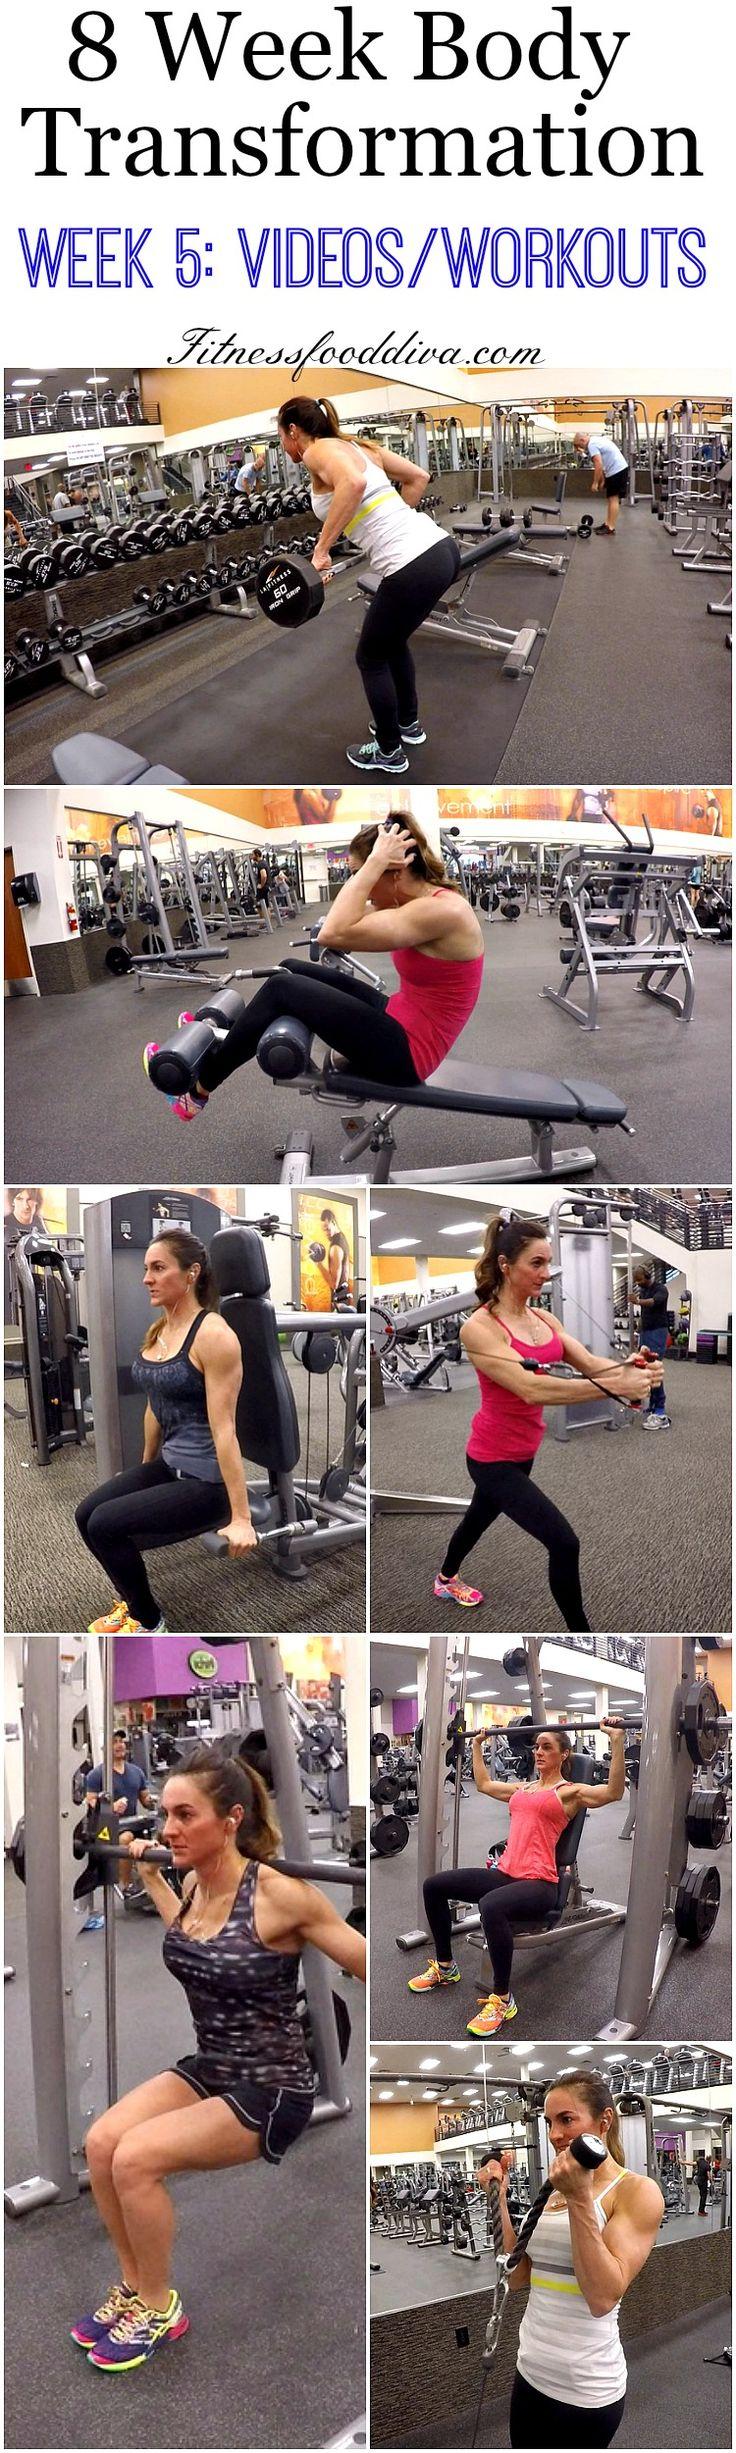 8 Week Body Transformation: Week 5 Videos/Workouts